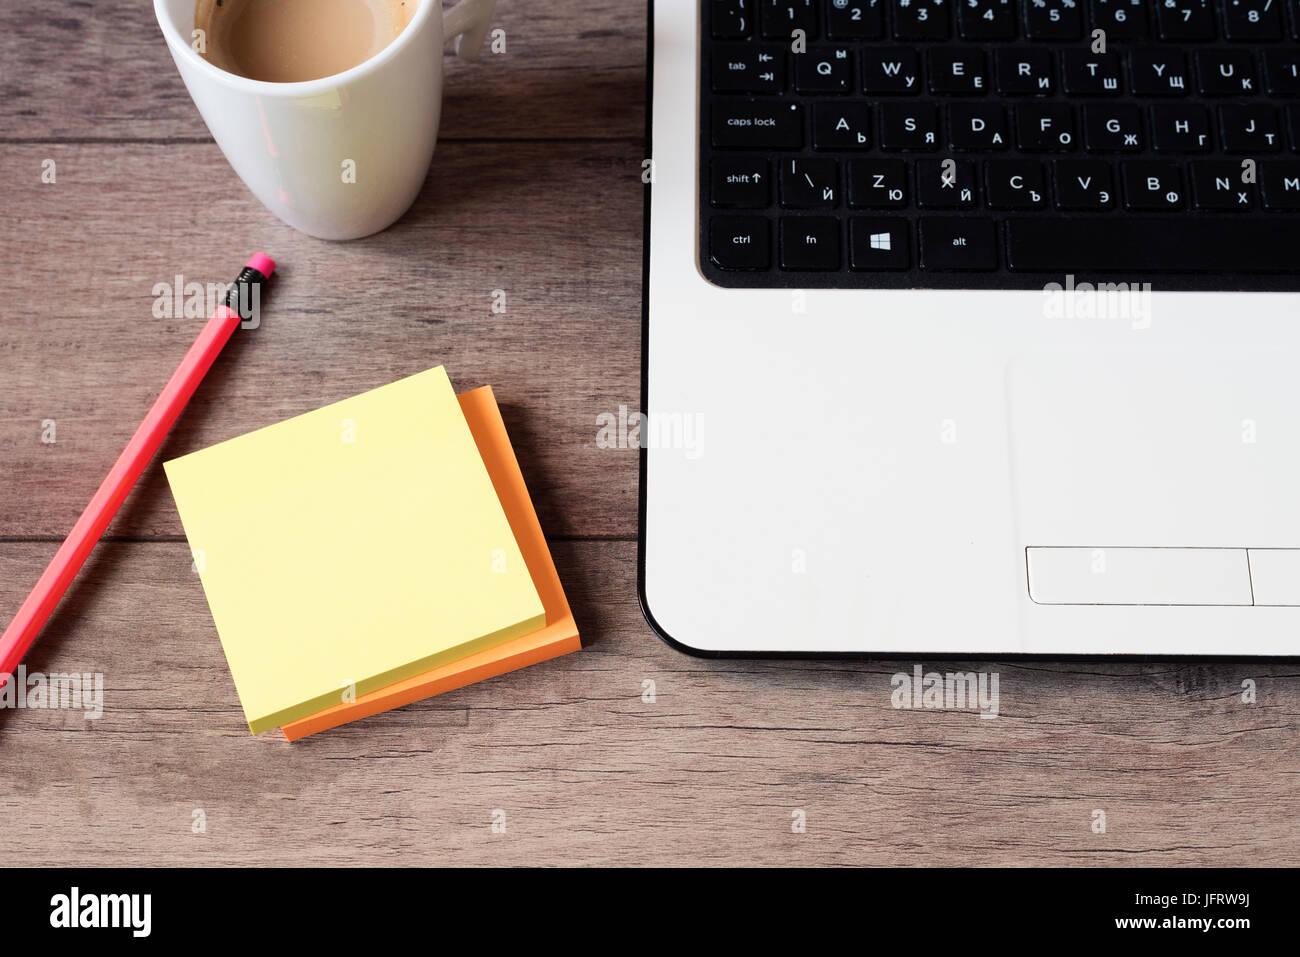 Image de bureau bois bureau avec ordinateur portable clavier